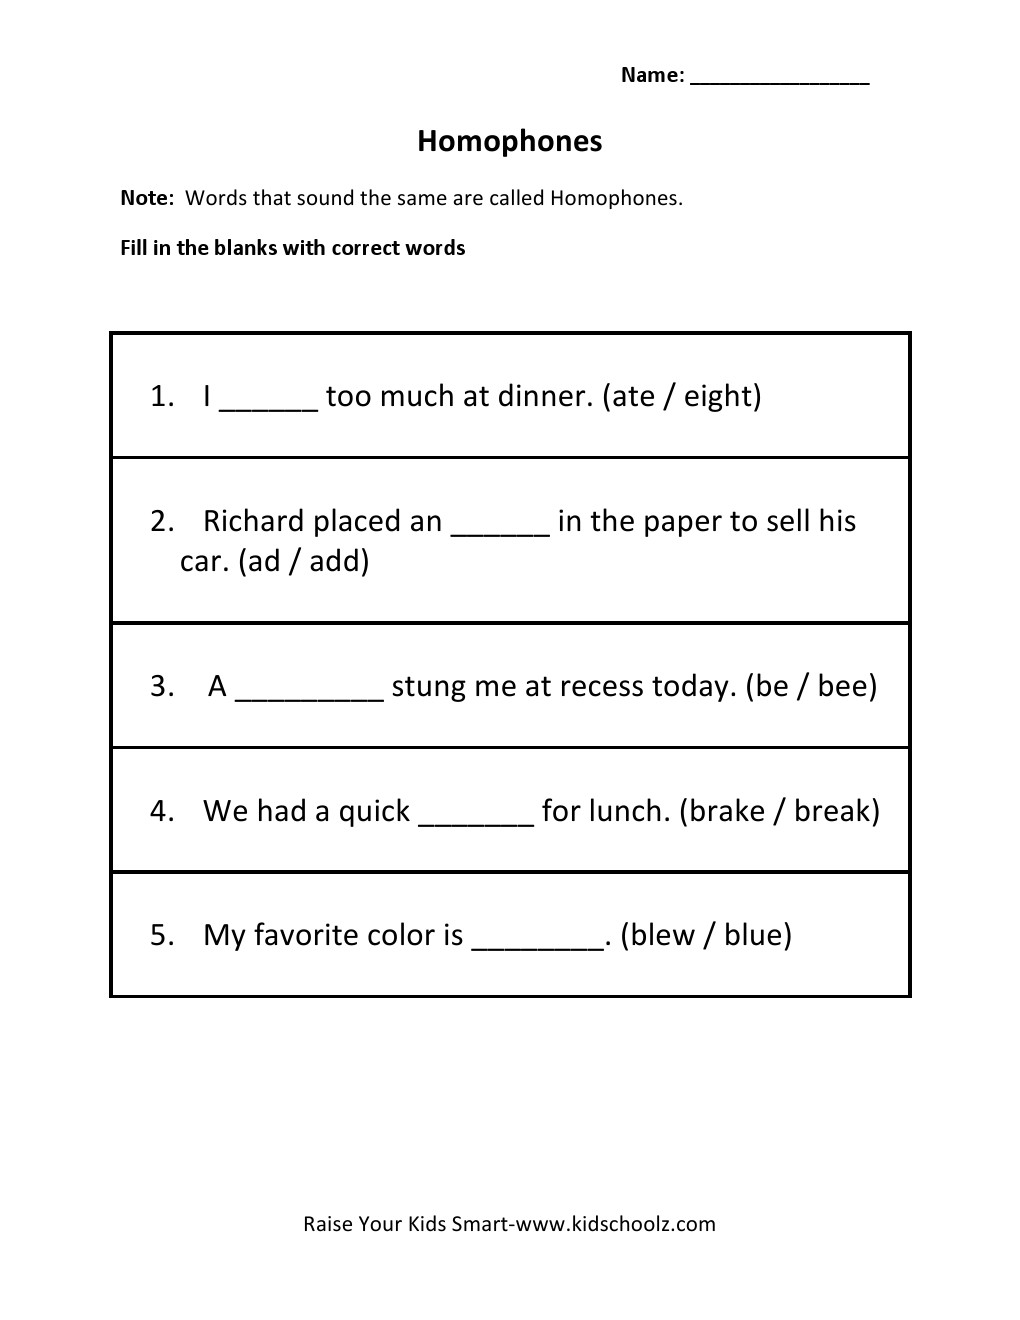 Workbooks homonyms worksheets middle school : Worksheets. Homophones Worksheets. eihseba.com Free Worksheets for ...